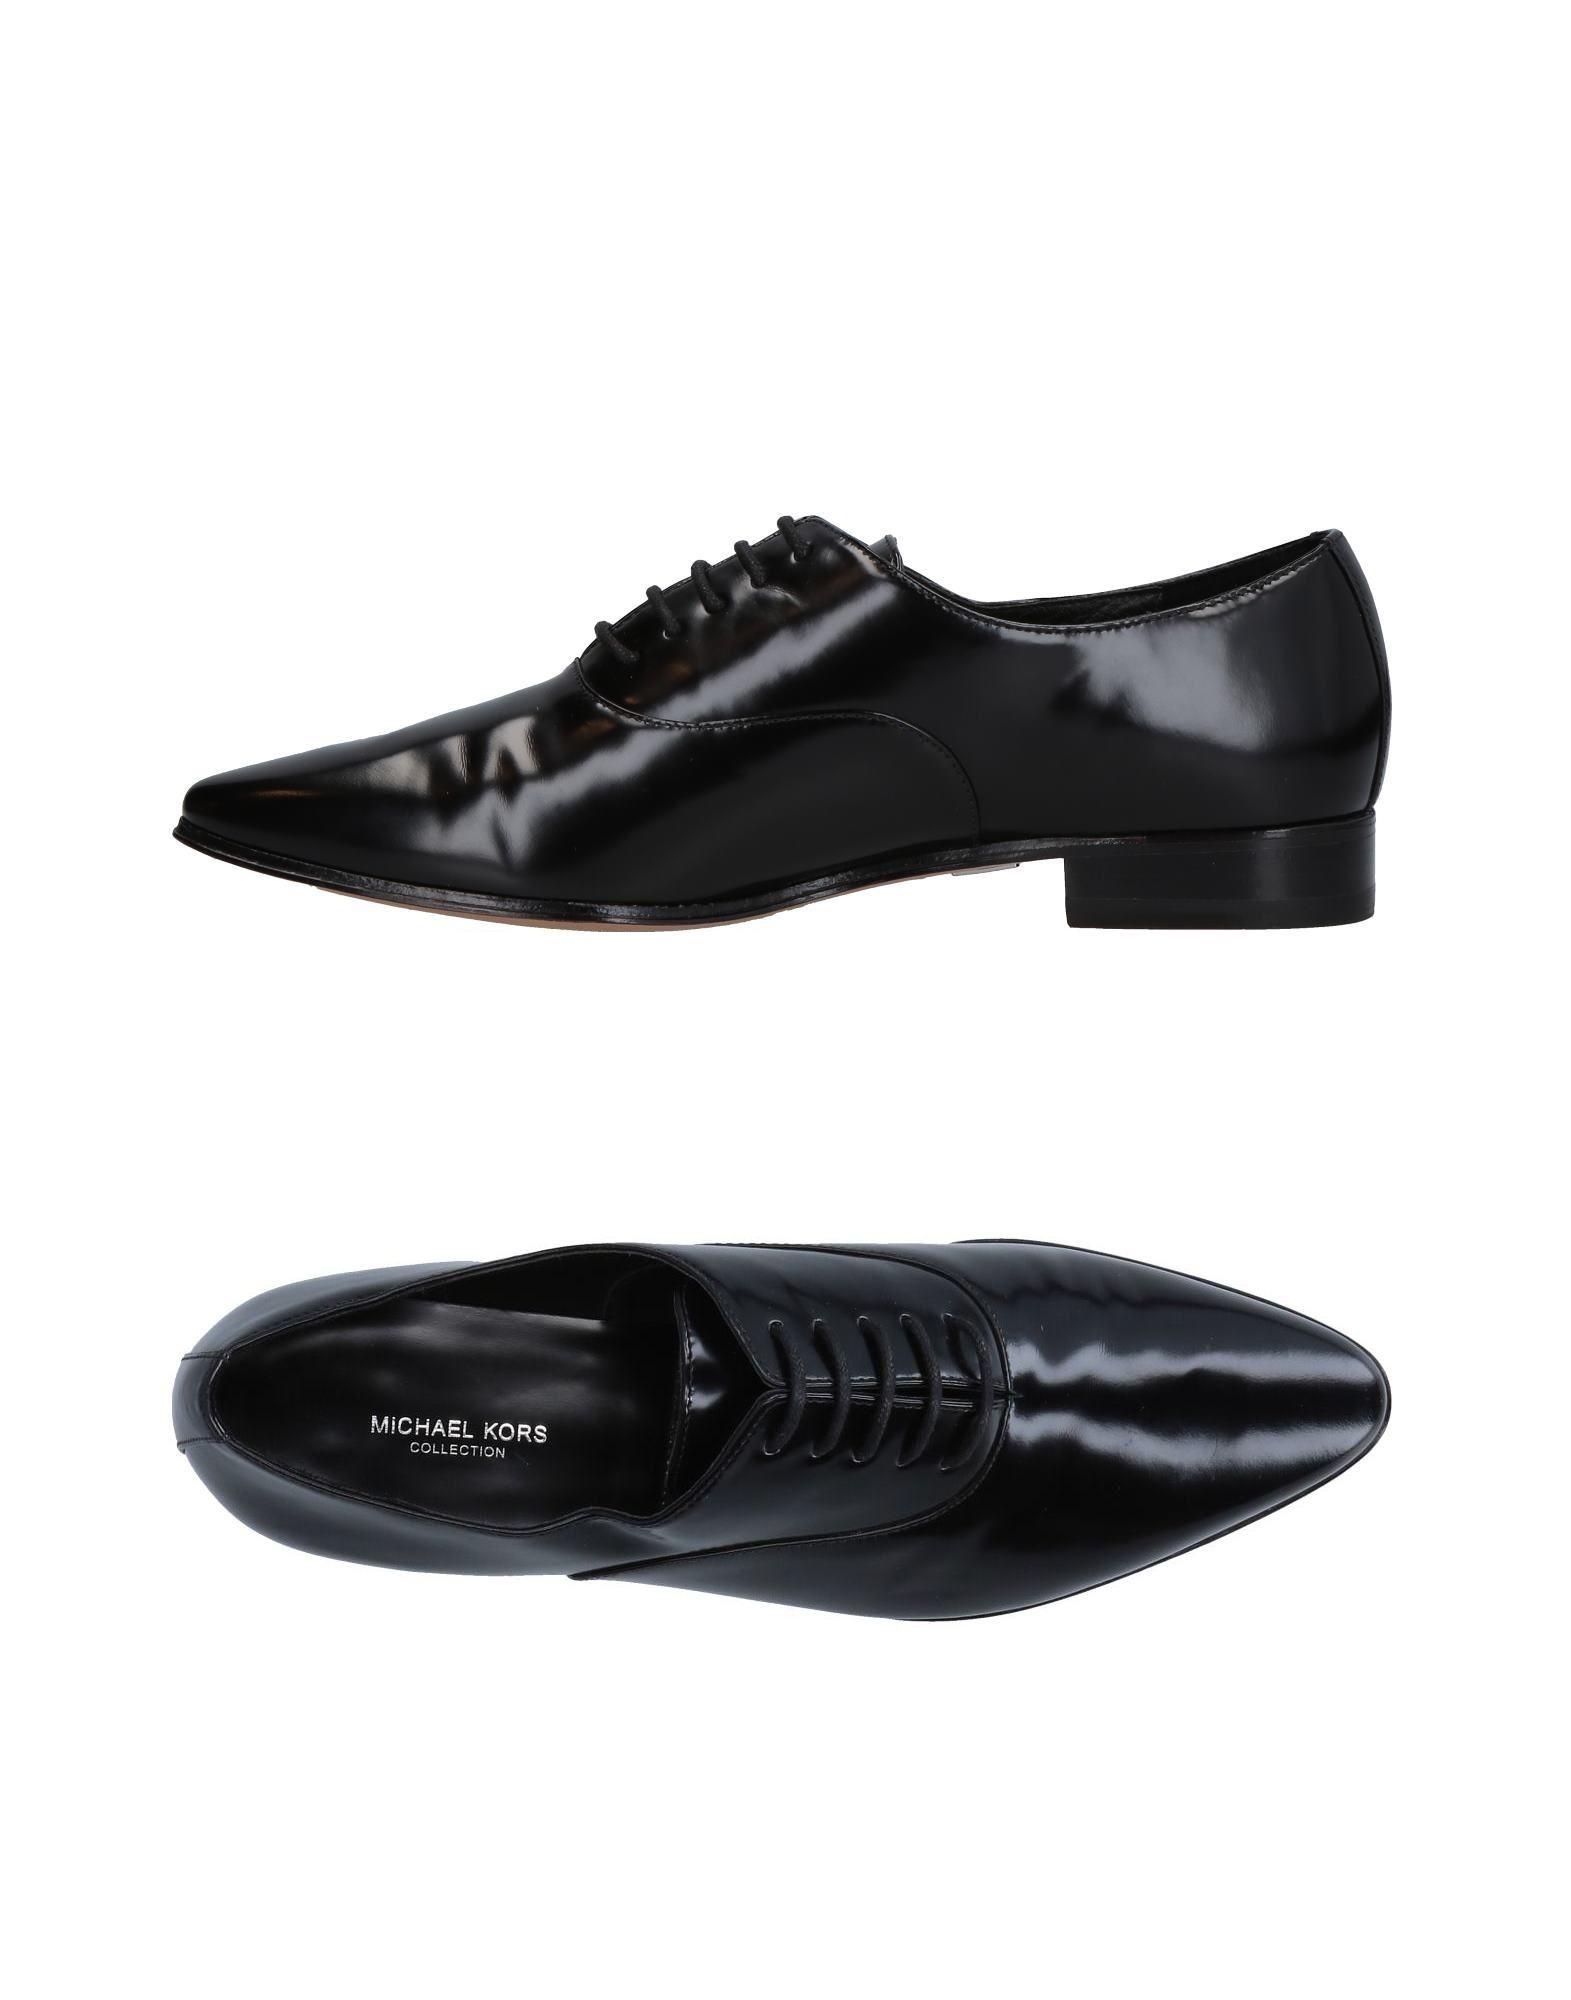 MICHAEL KORS COLLECTION Обувь на шнурках цены онлайн